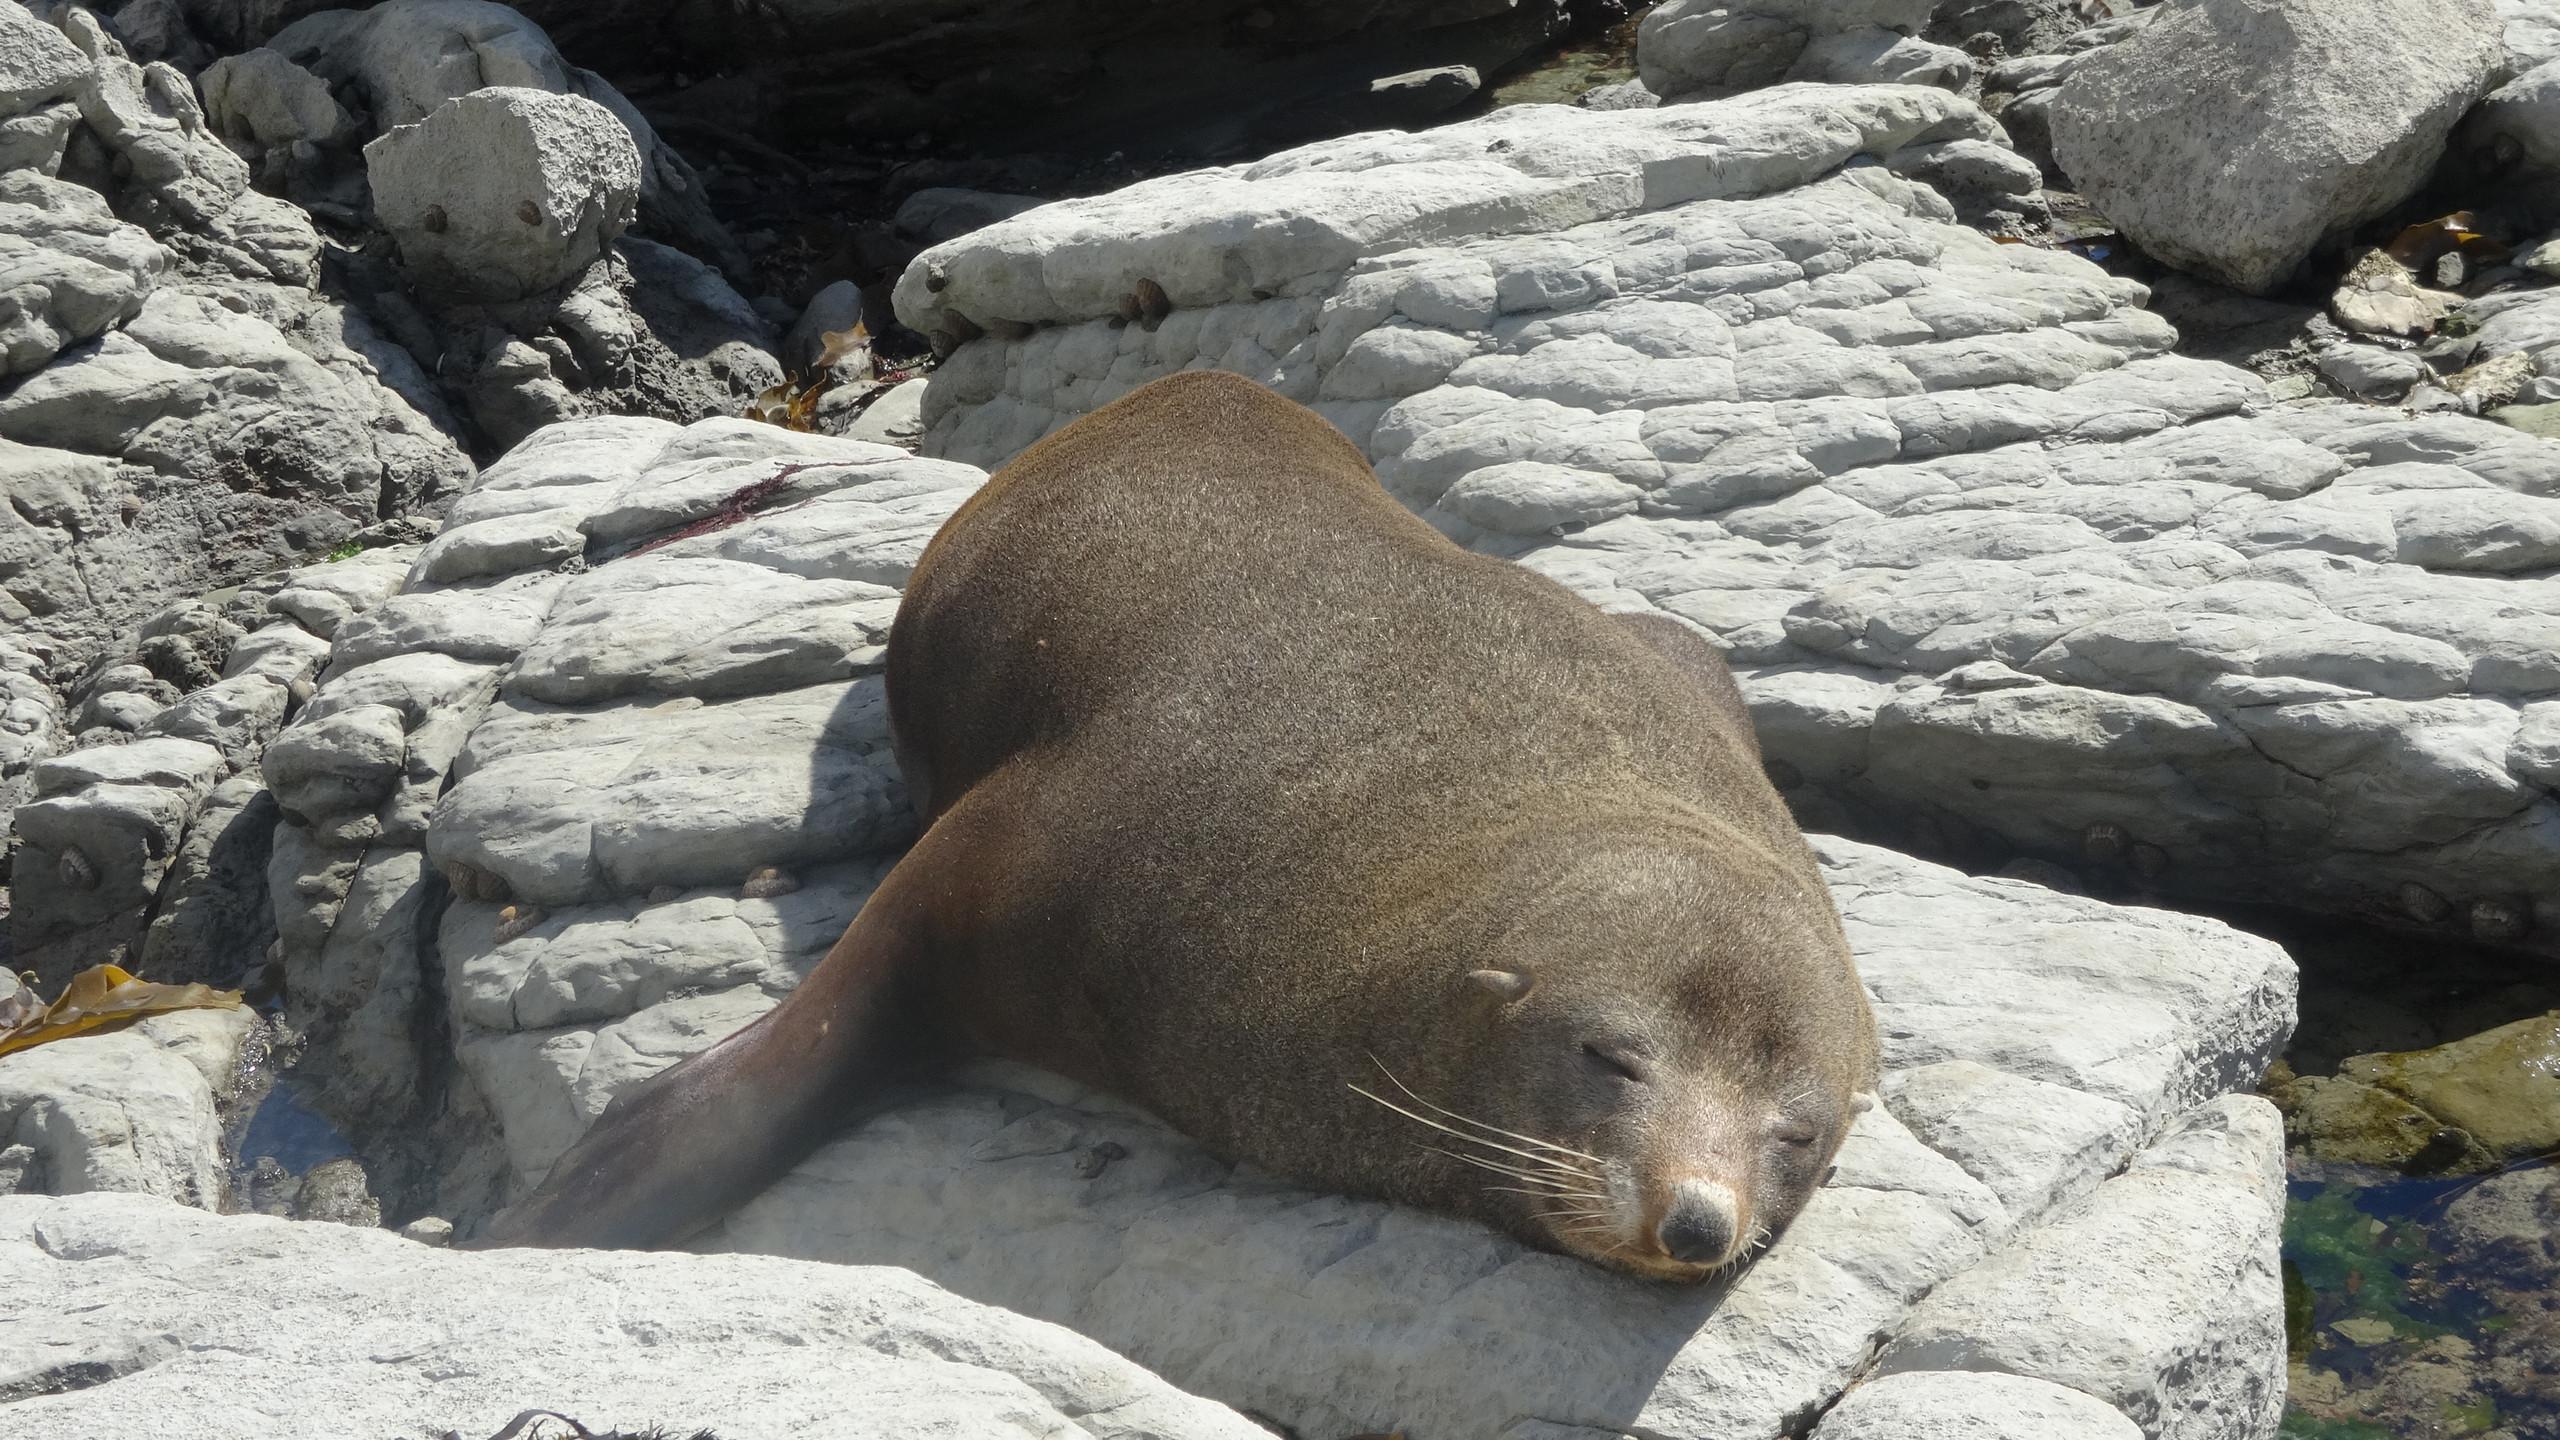 A fur seal in Kaikoura, New Zealand activities, New Zealand tours